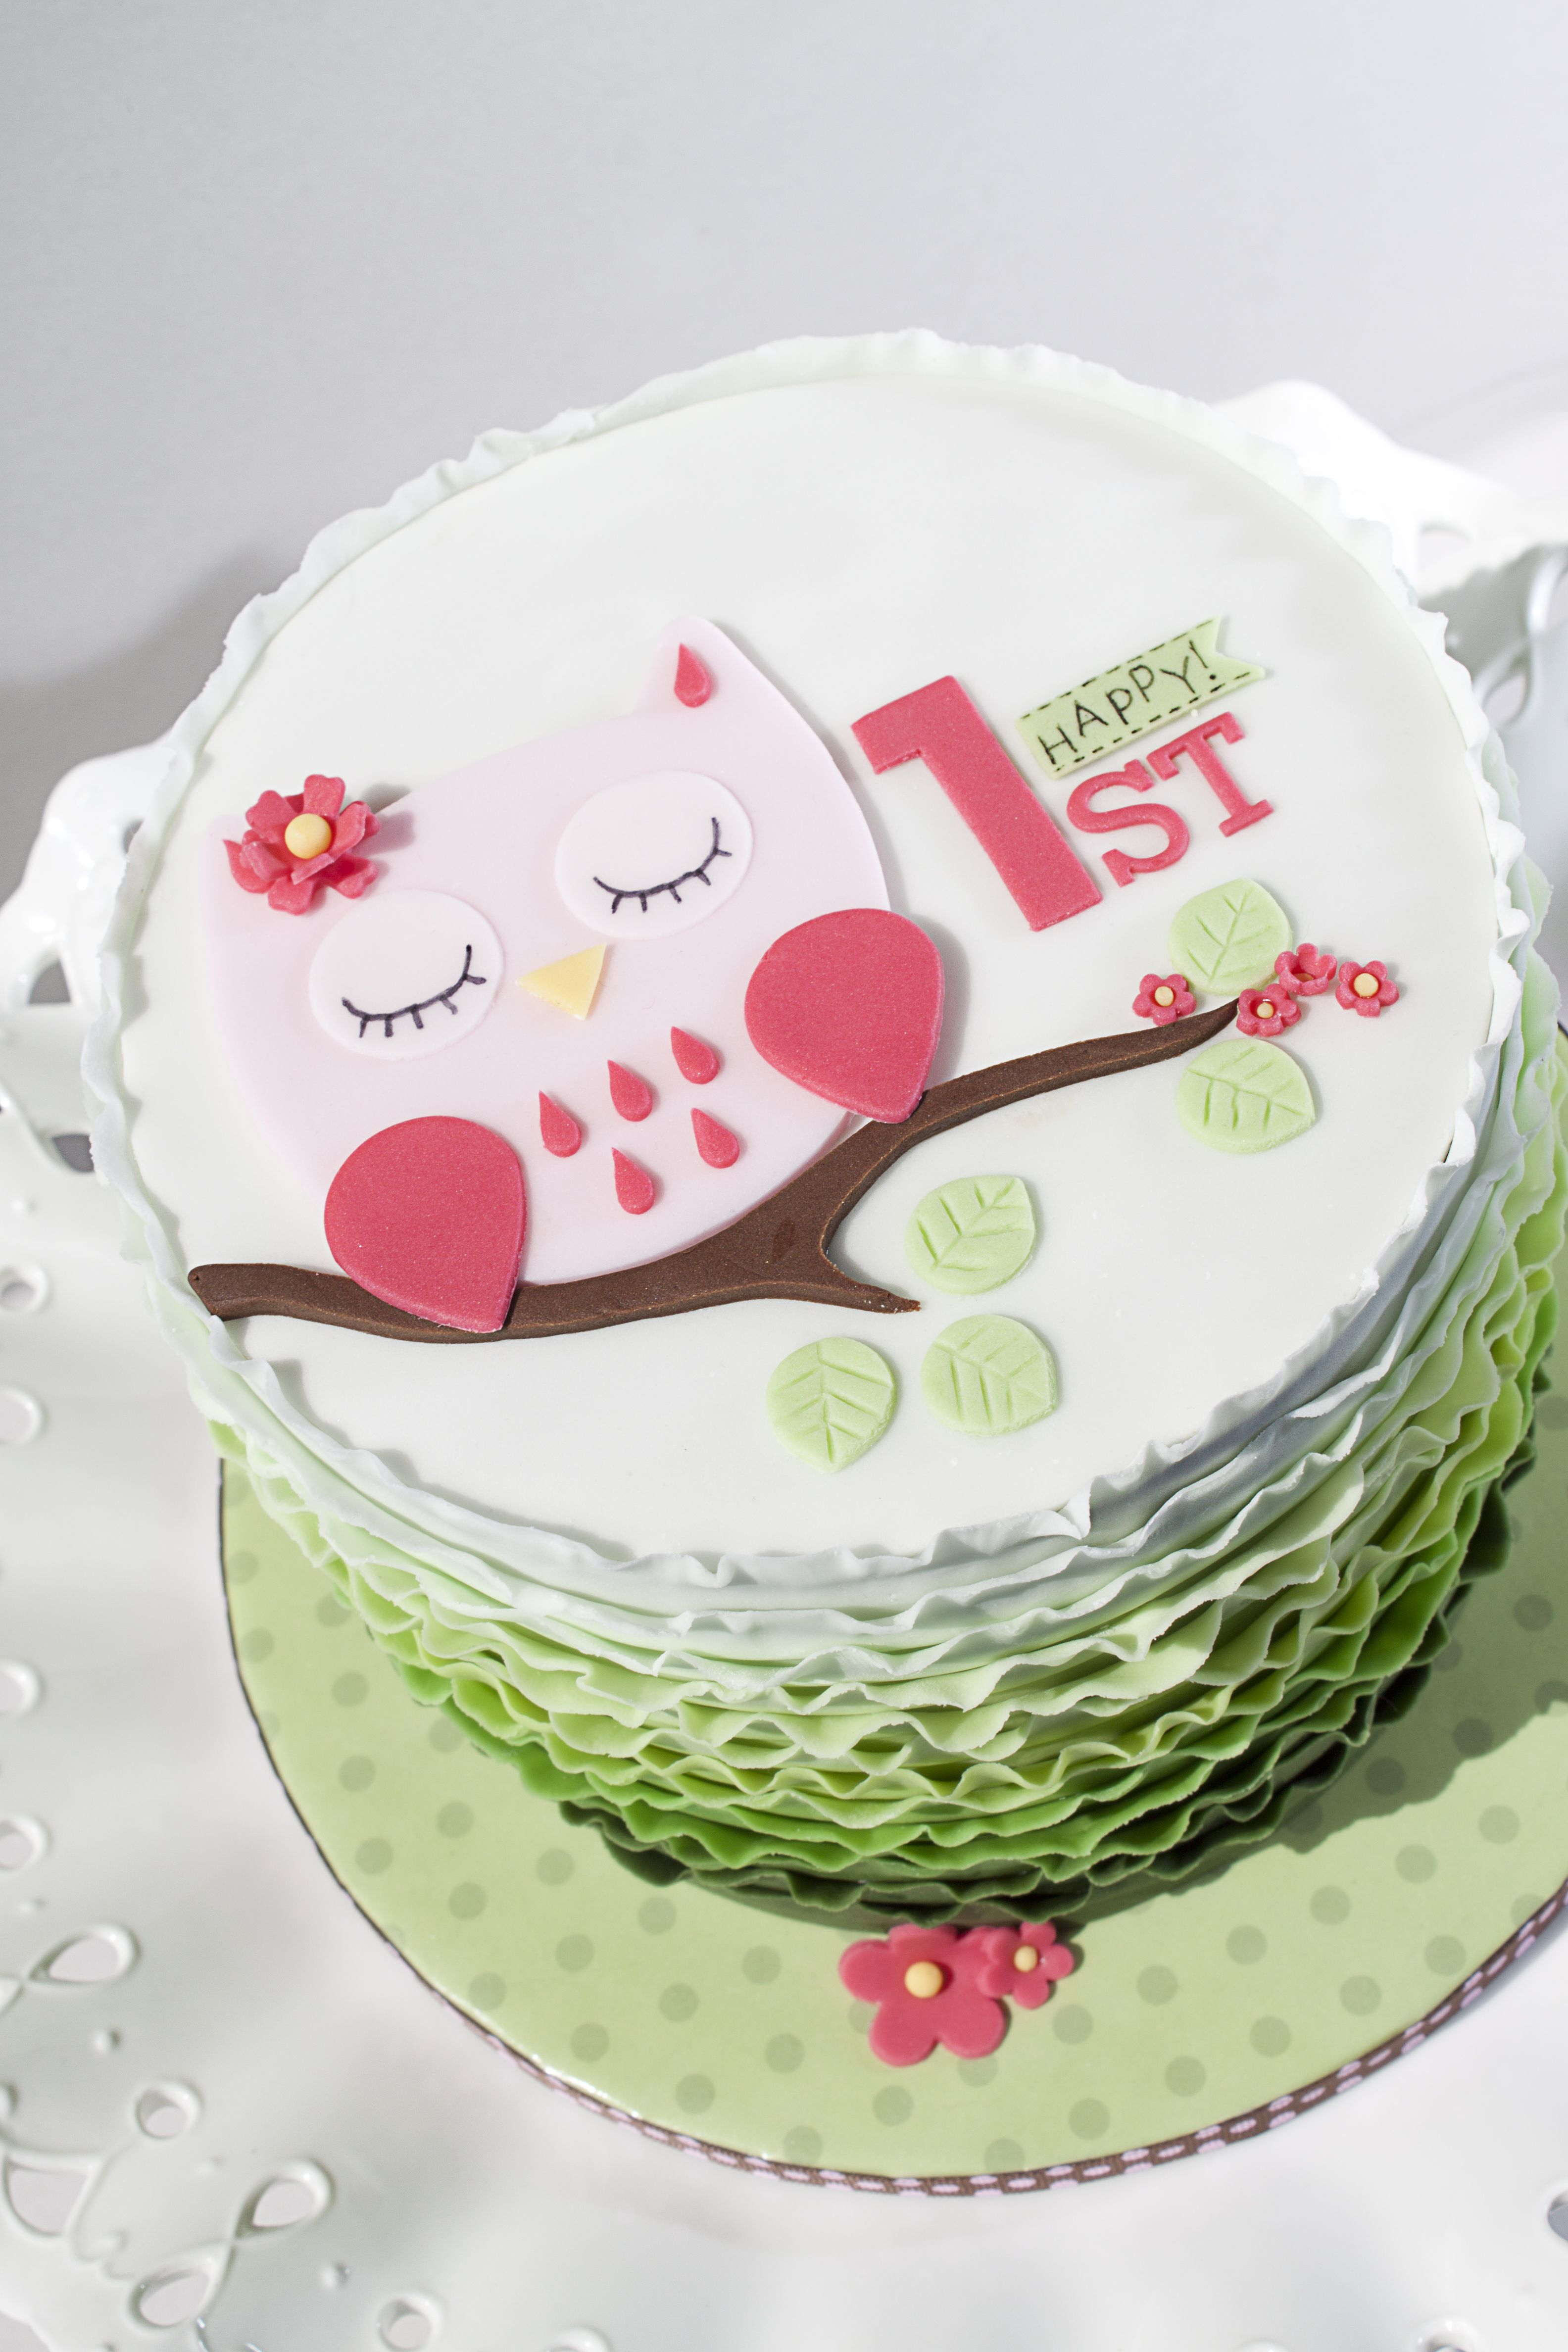 Ombre Ruffle Owl Cake Girls cake Pinterest Owl cakes Cake